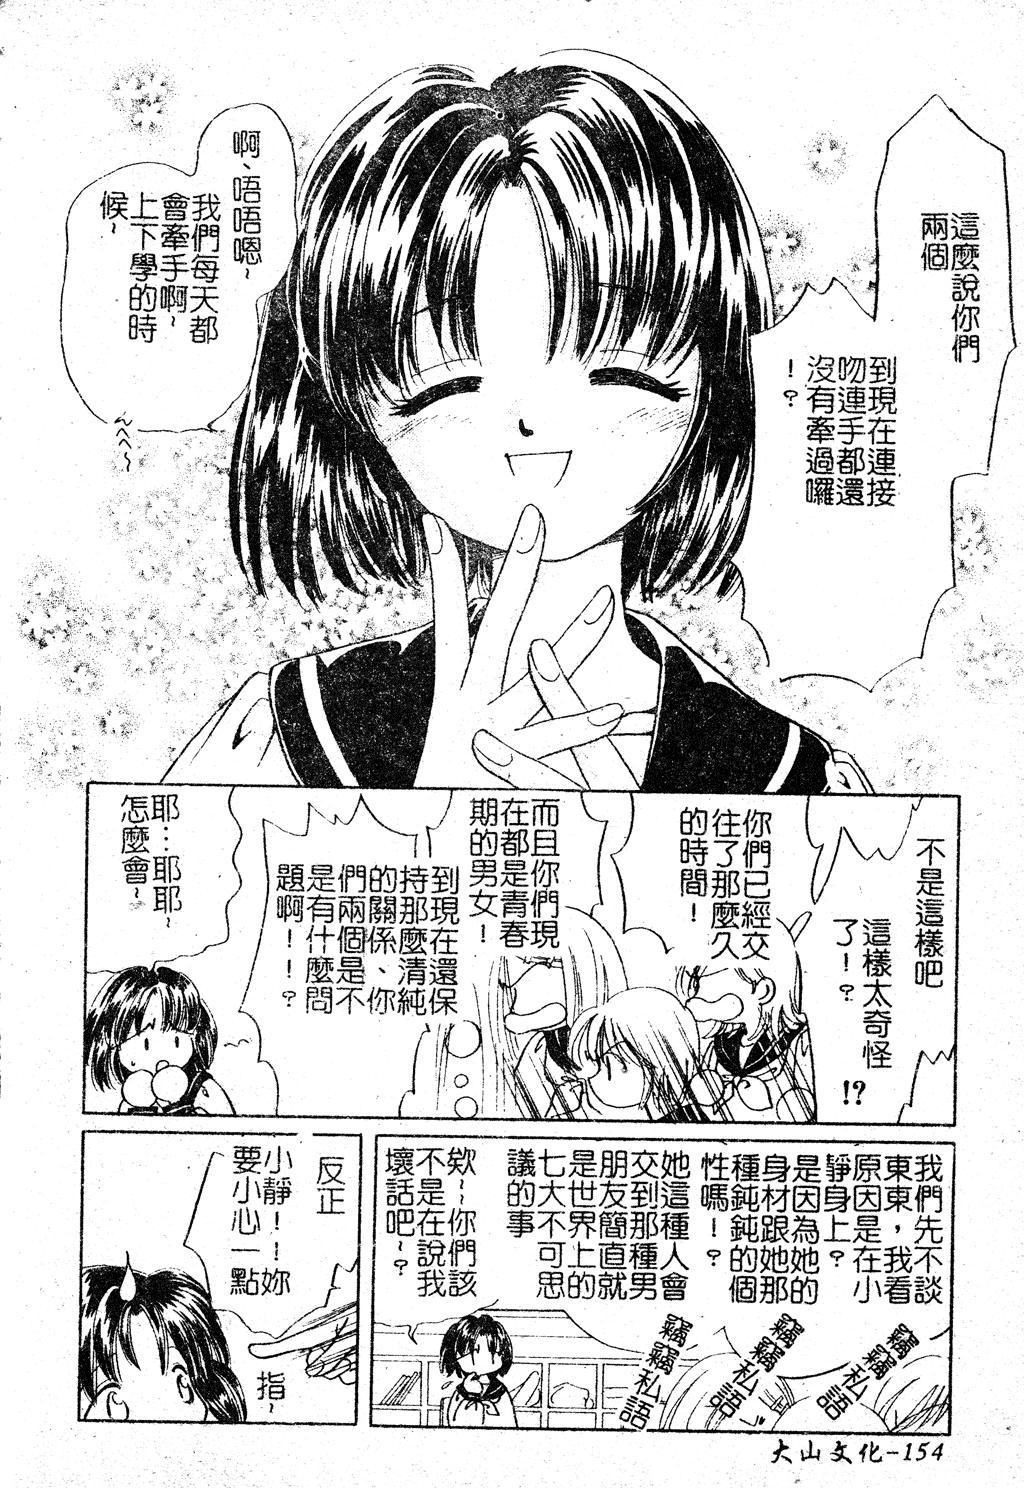 DenNow Koihime Collection 7 152